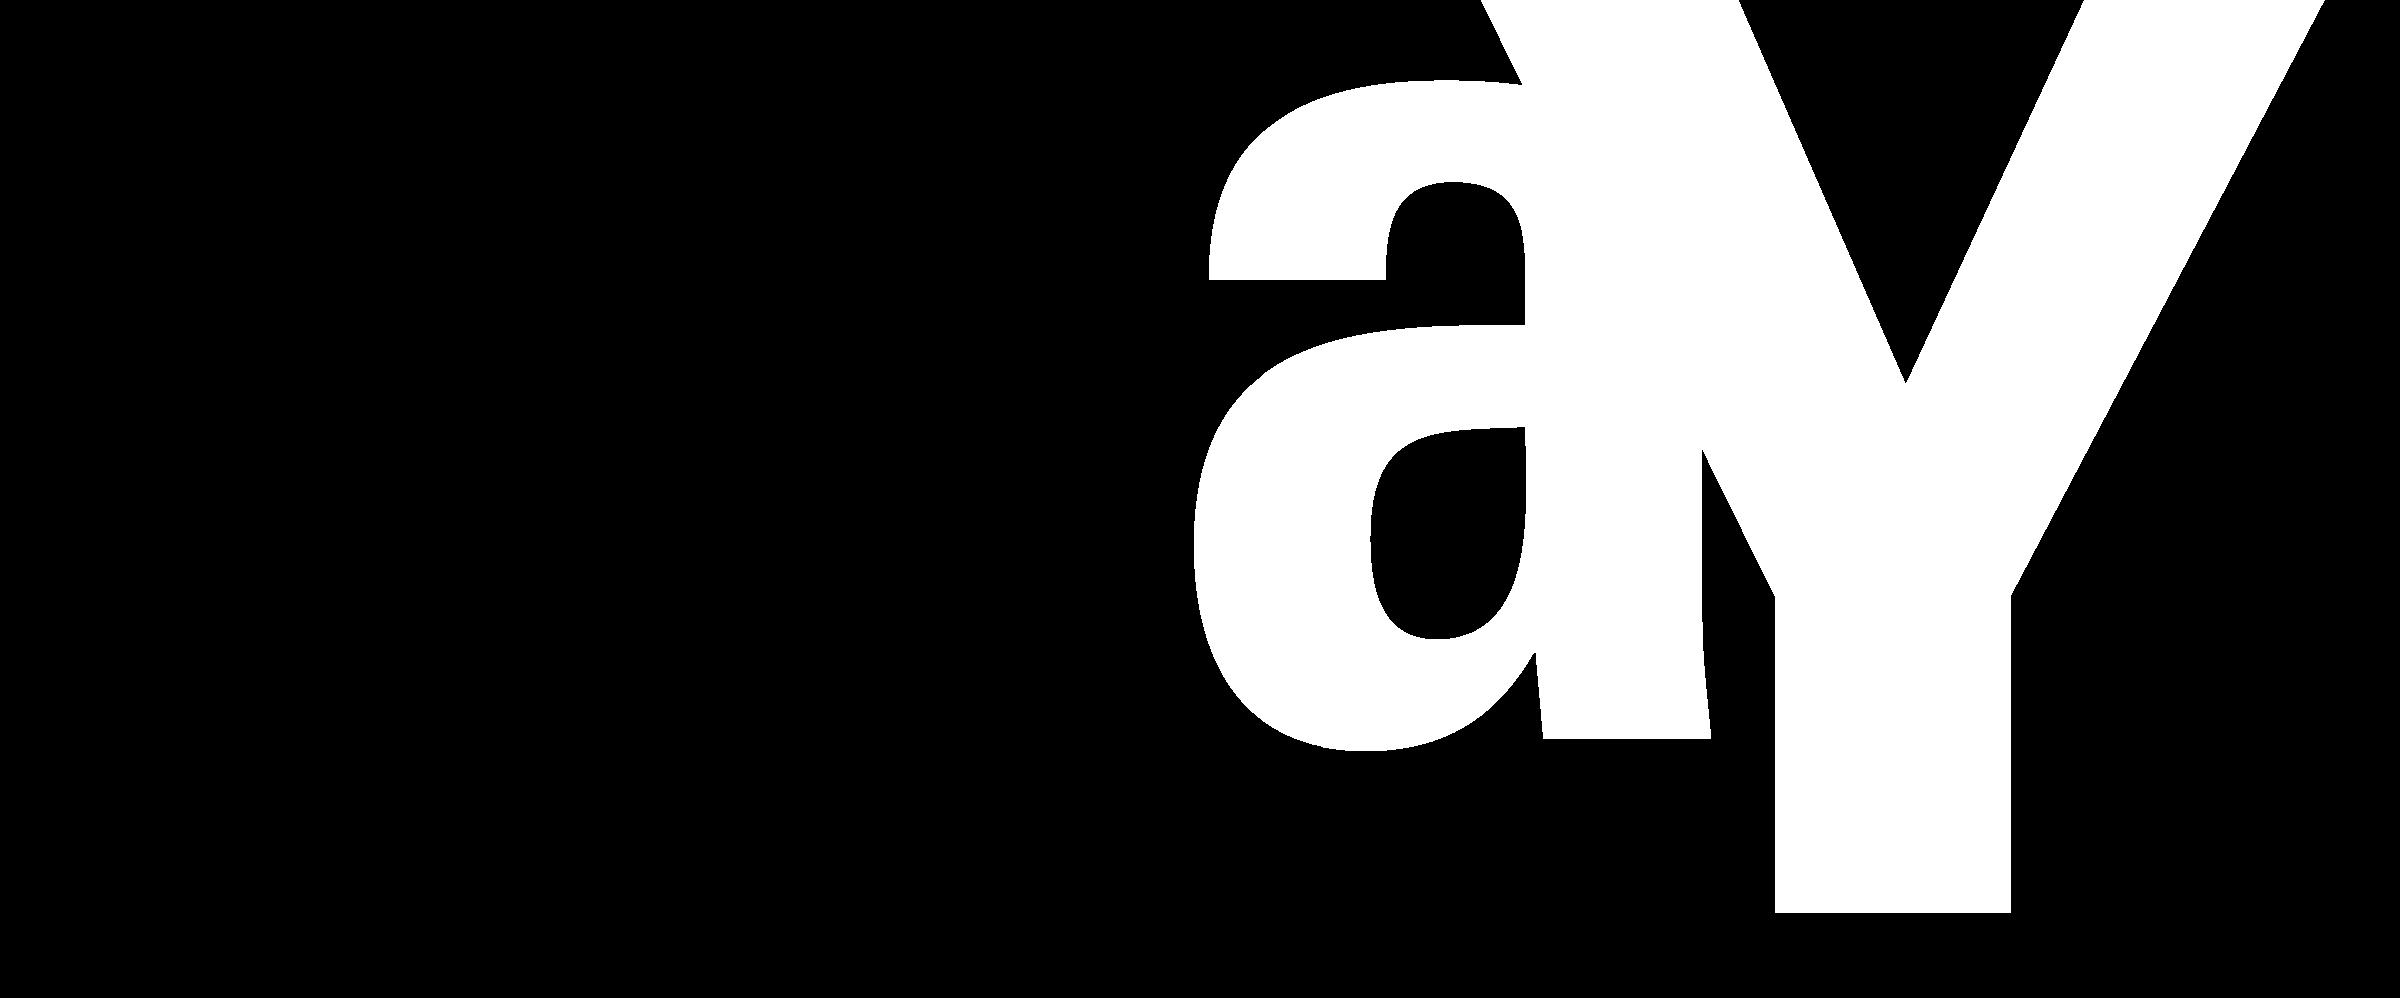 Download Ebay Logo Black And White Ebay Logo Transparent Png Image With No Background Pngkey Com